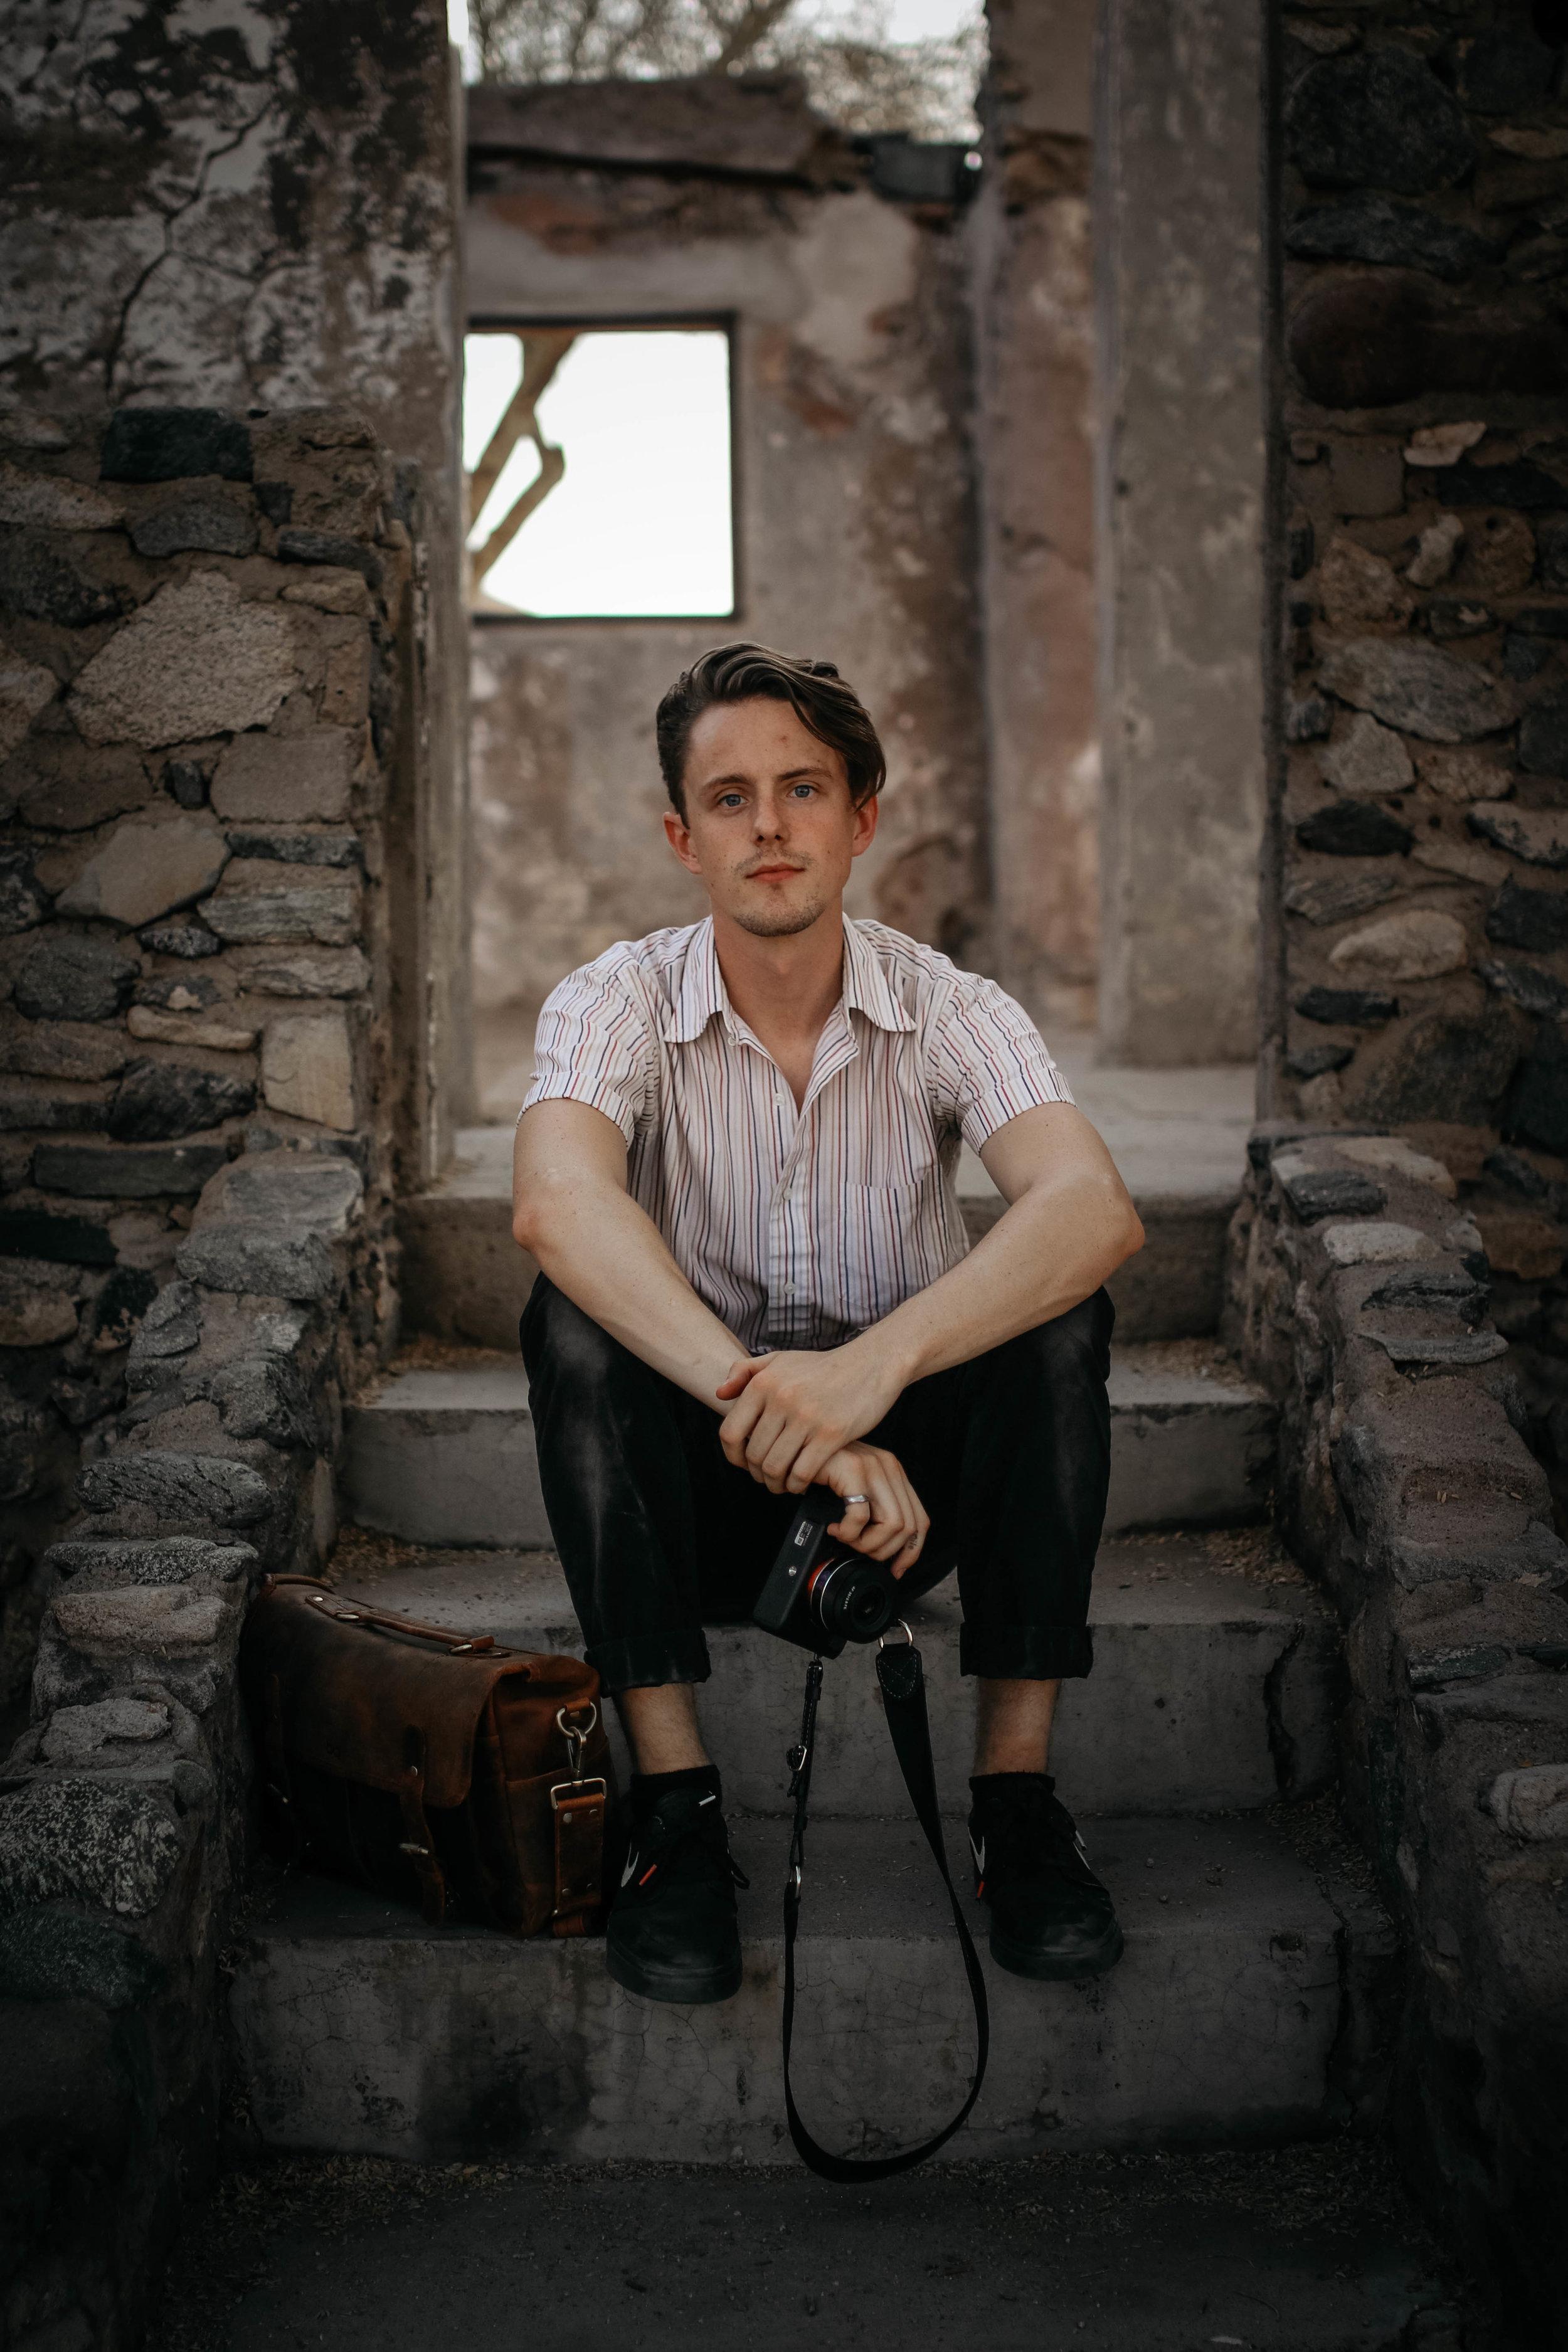 Nathan Grebe - photographer, skateboarder | @fixedformat   nathangrebephotography.com